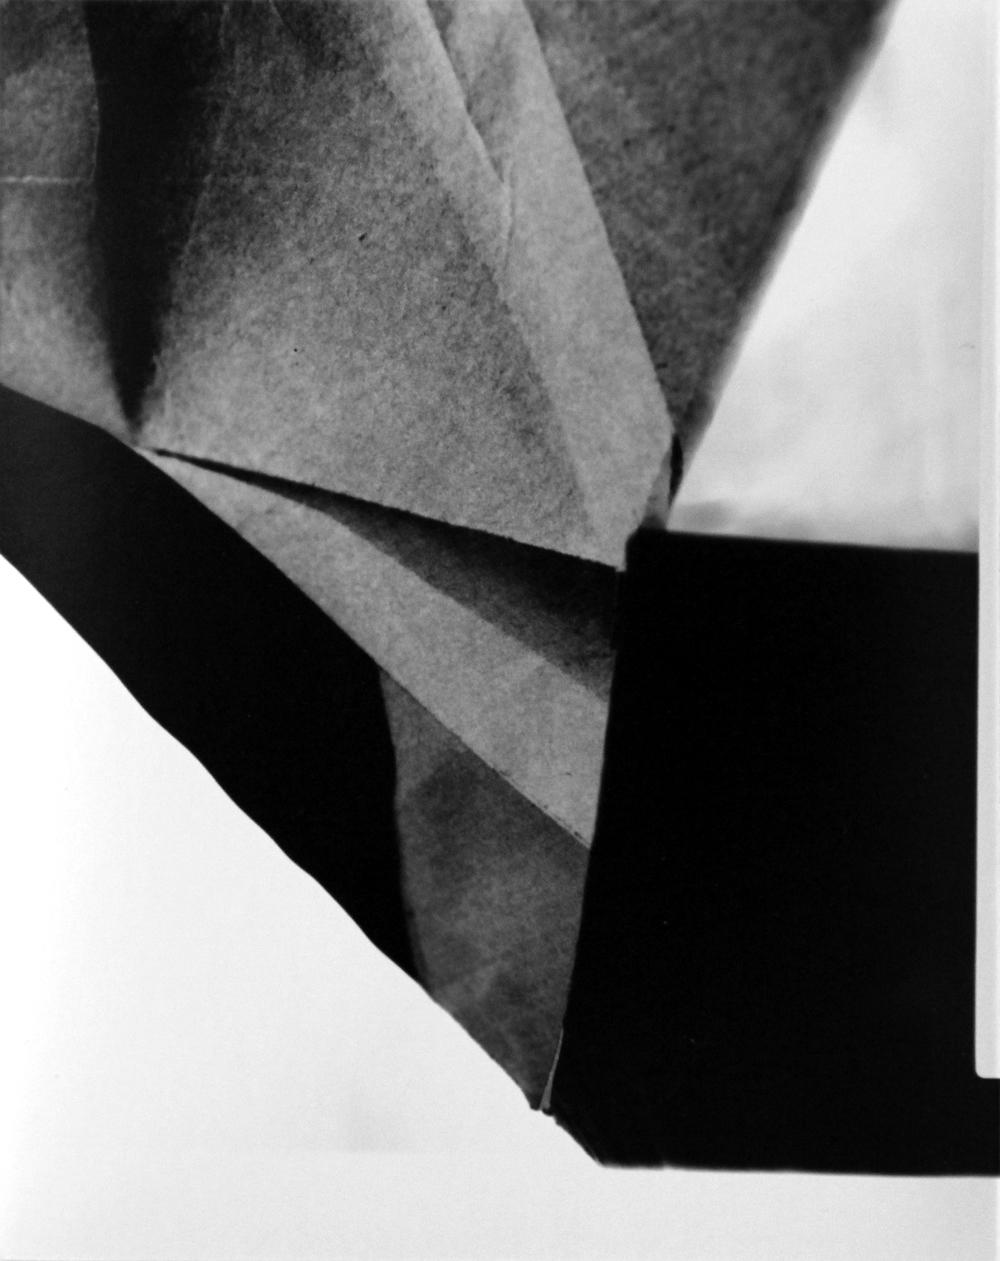 gelatin silver print (paper negative)  4 3/4 x 3 3/4 inches